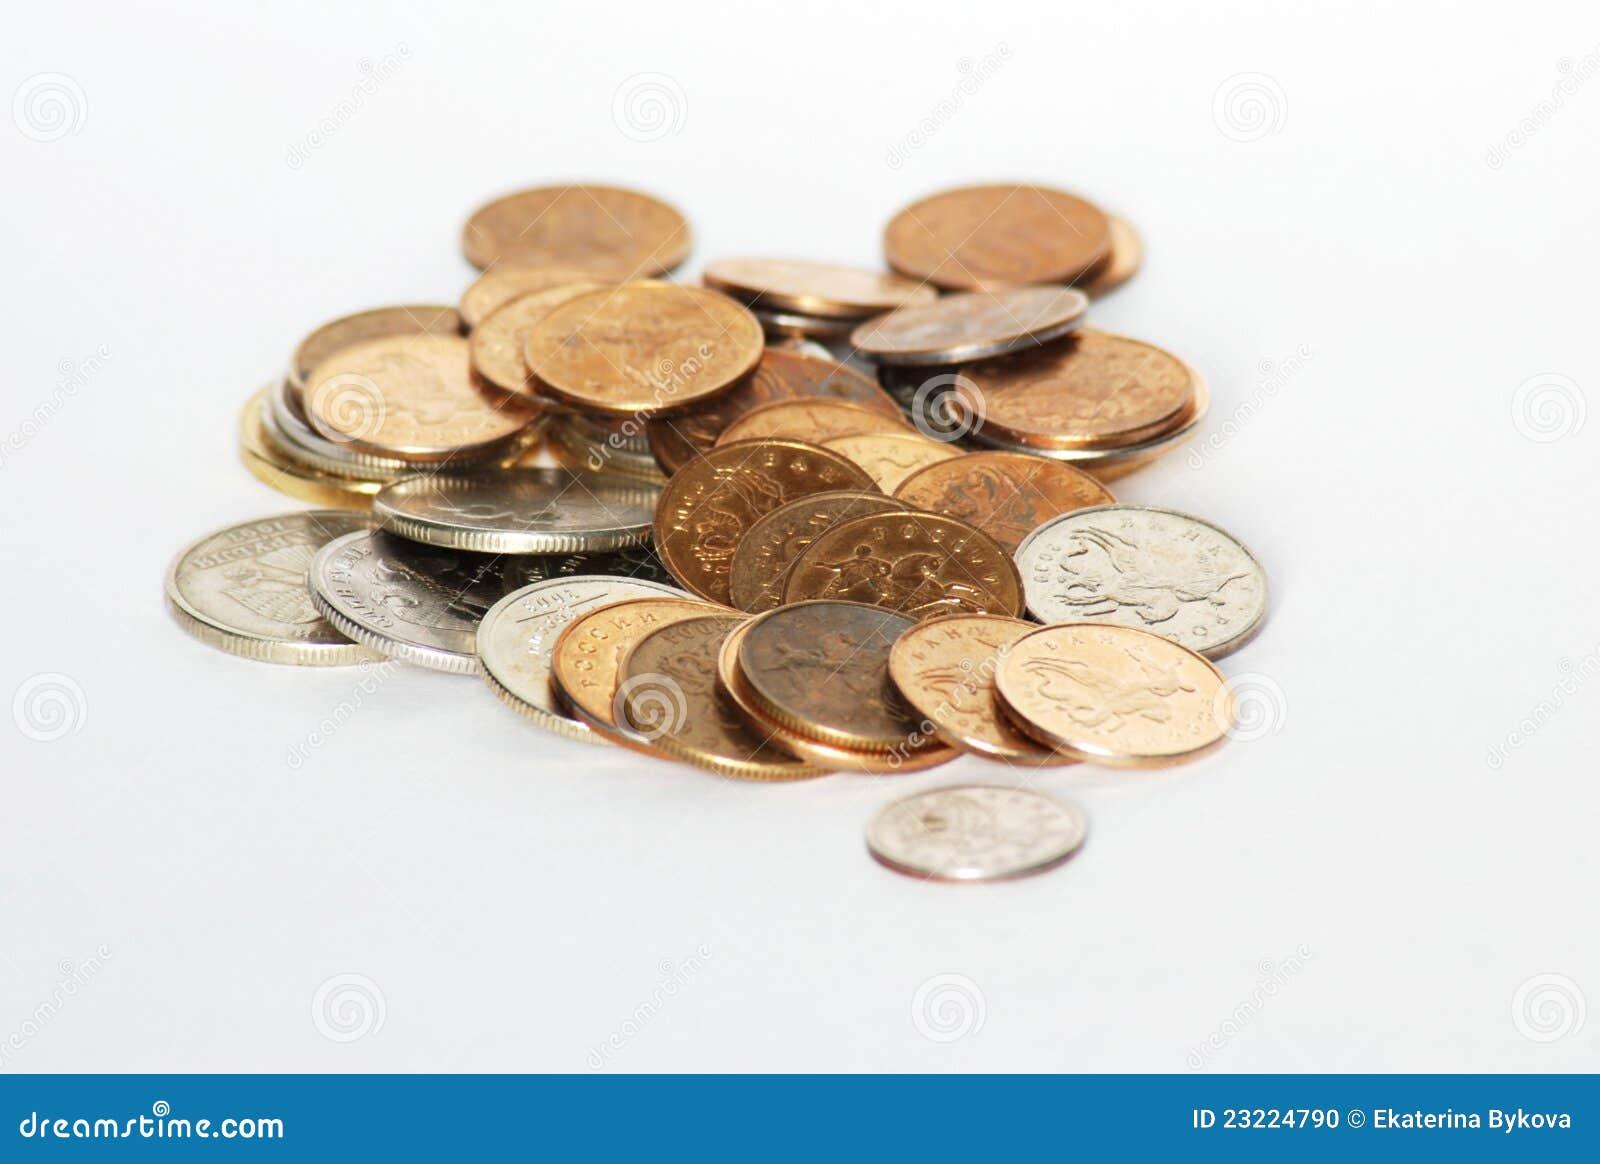 Golden coins money on white background